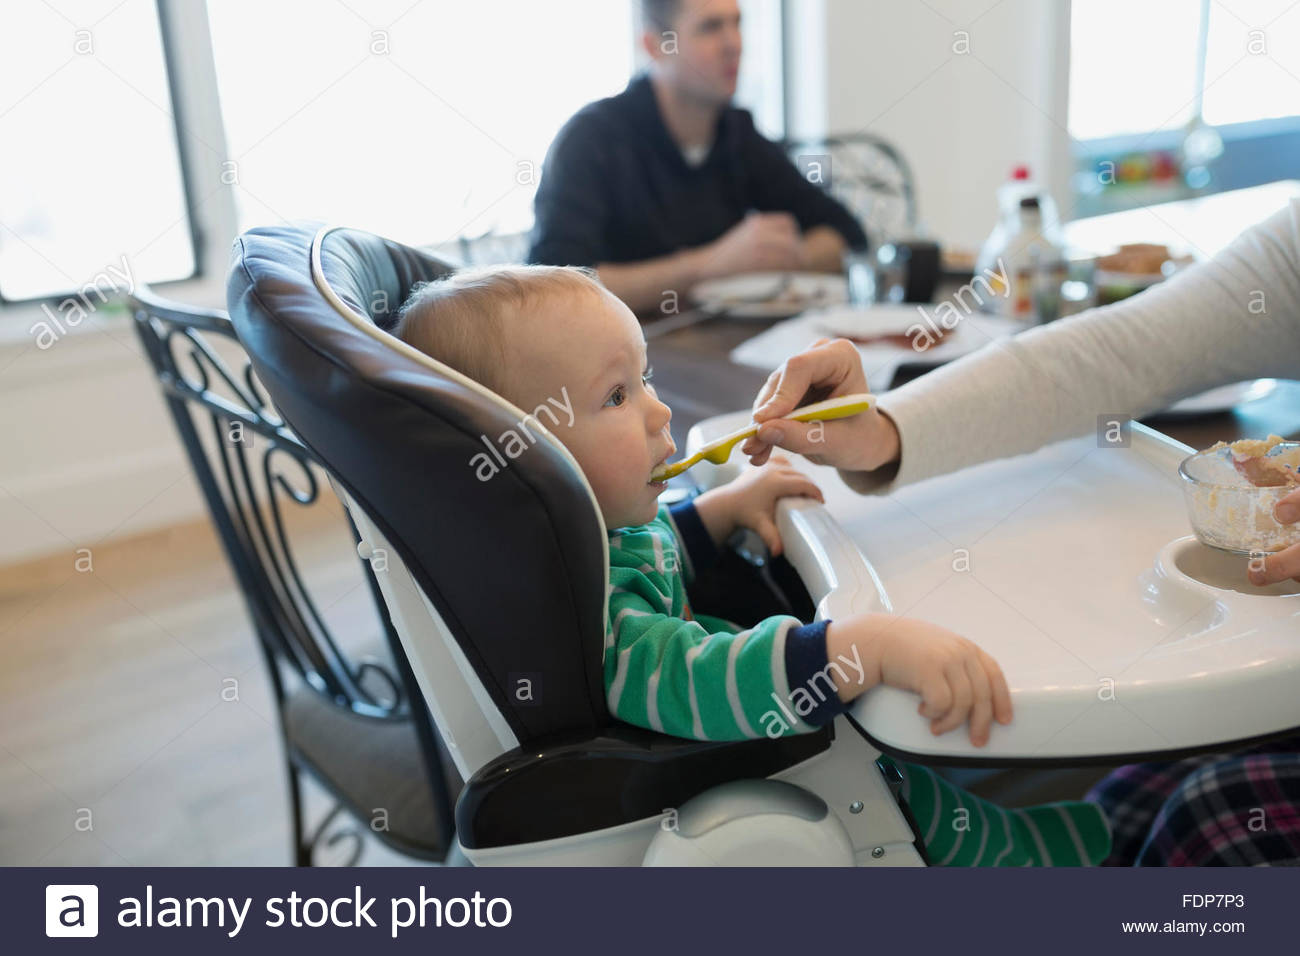 High photos high images alamy - Quand mettre bebe dans une chaise haute ...